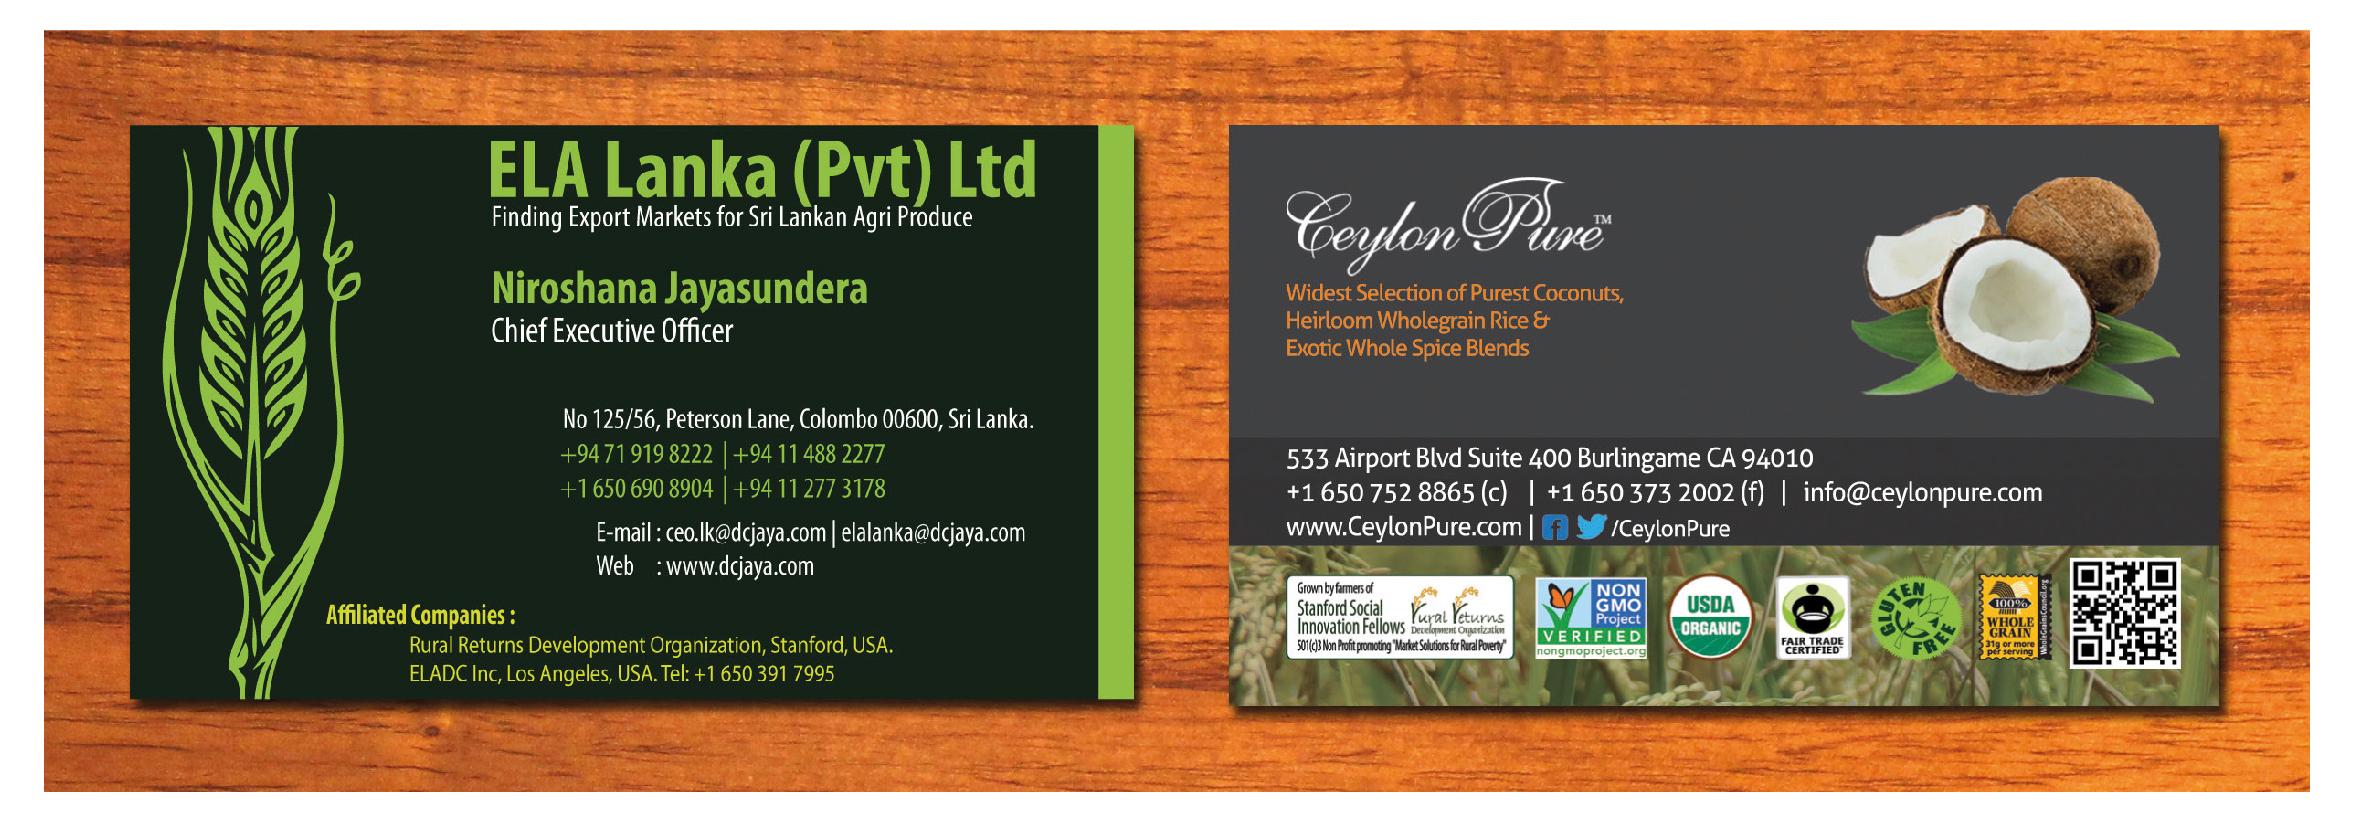 Business Cards Design – Lochana Asanka